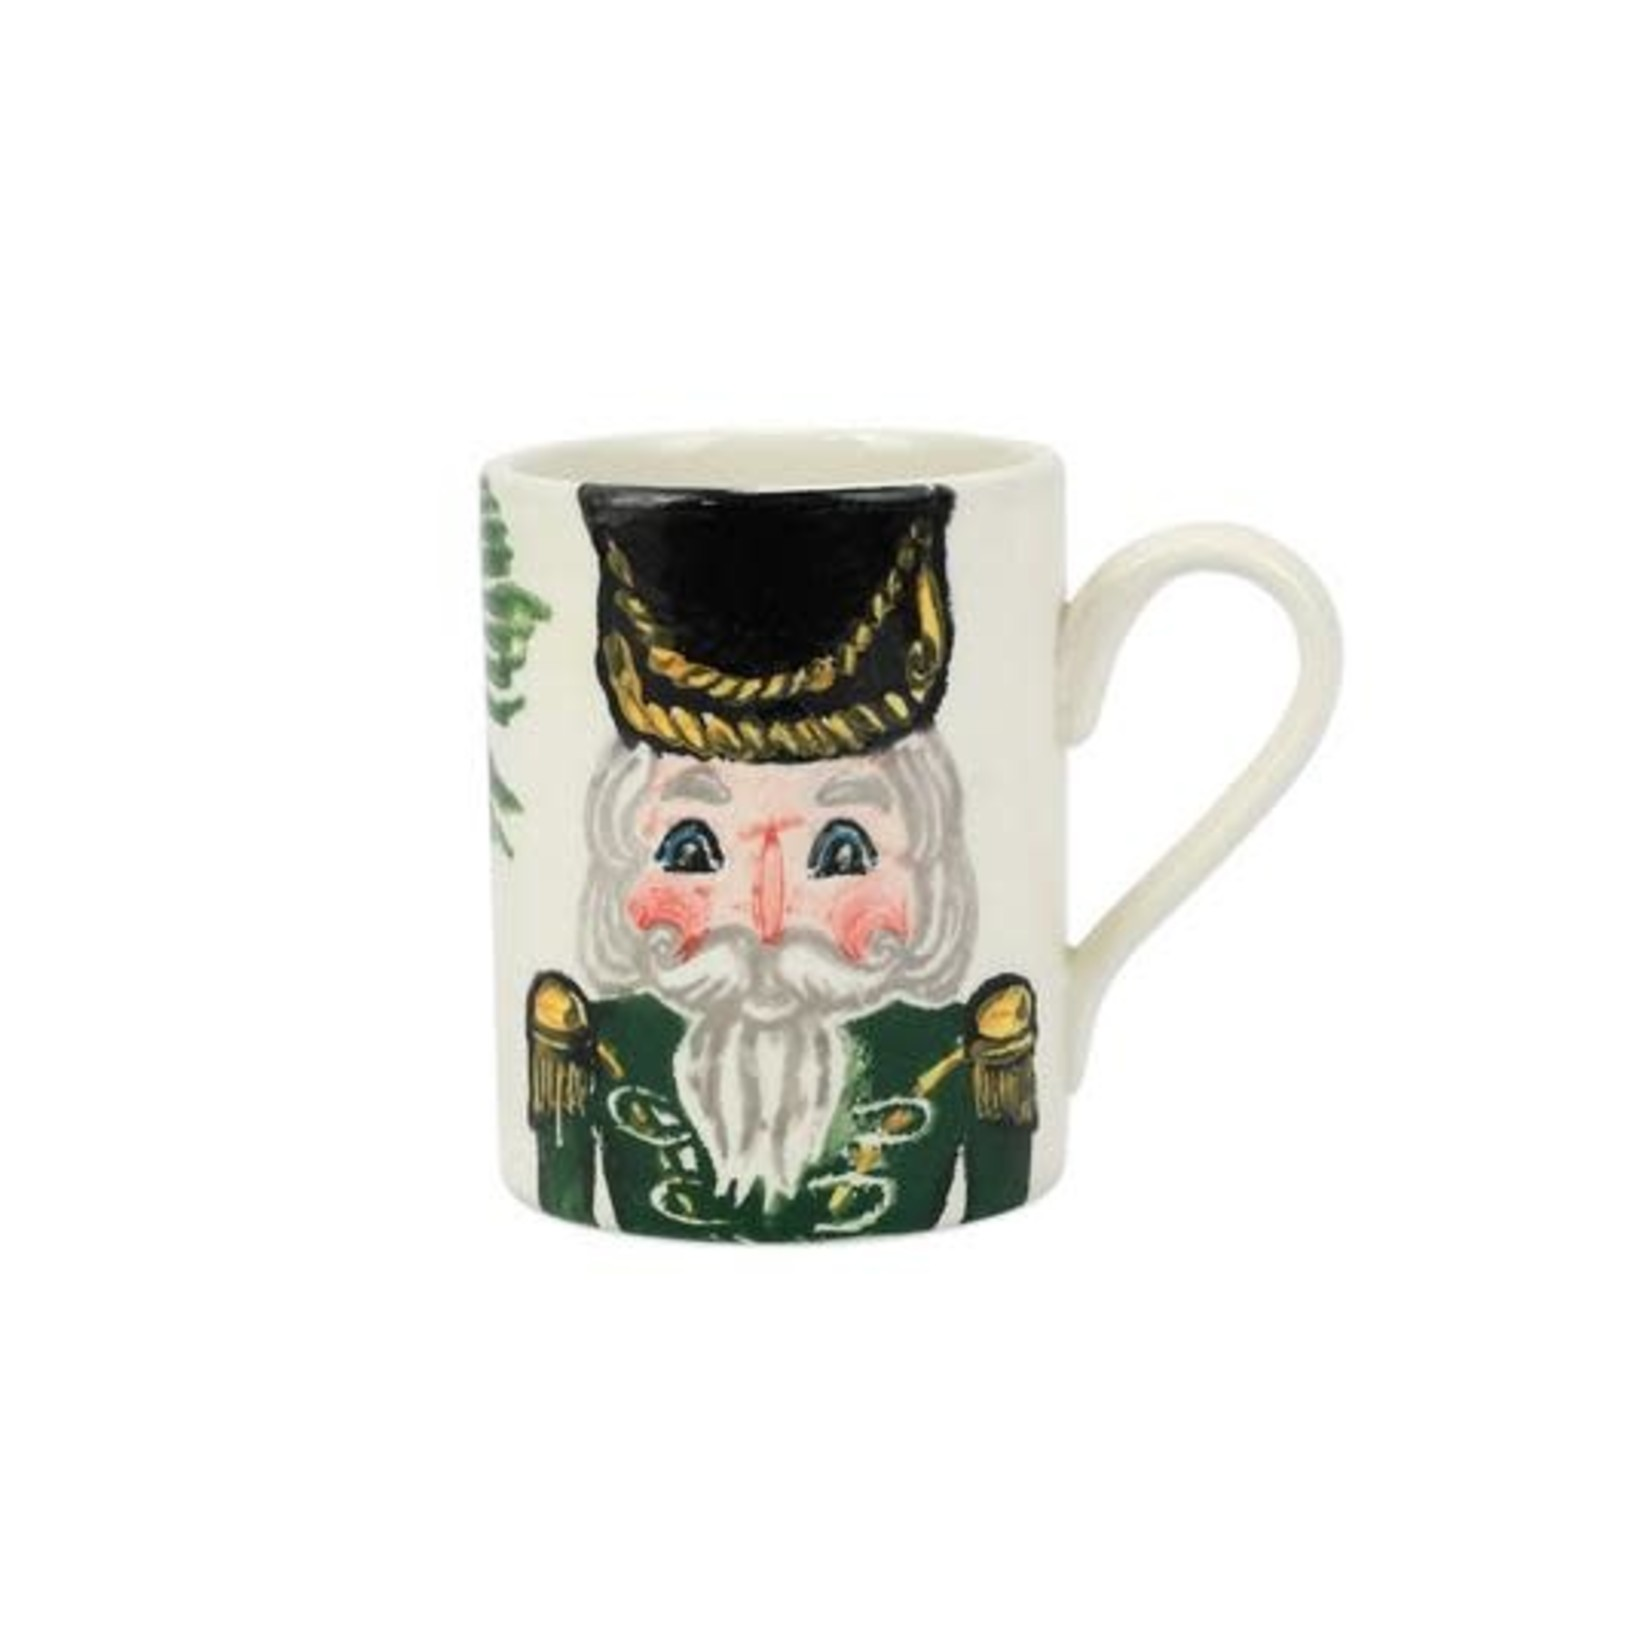 Nutcracker Mug Green